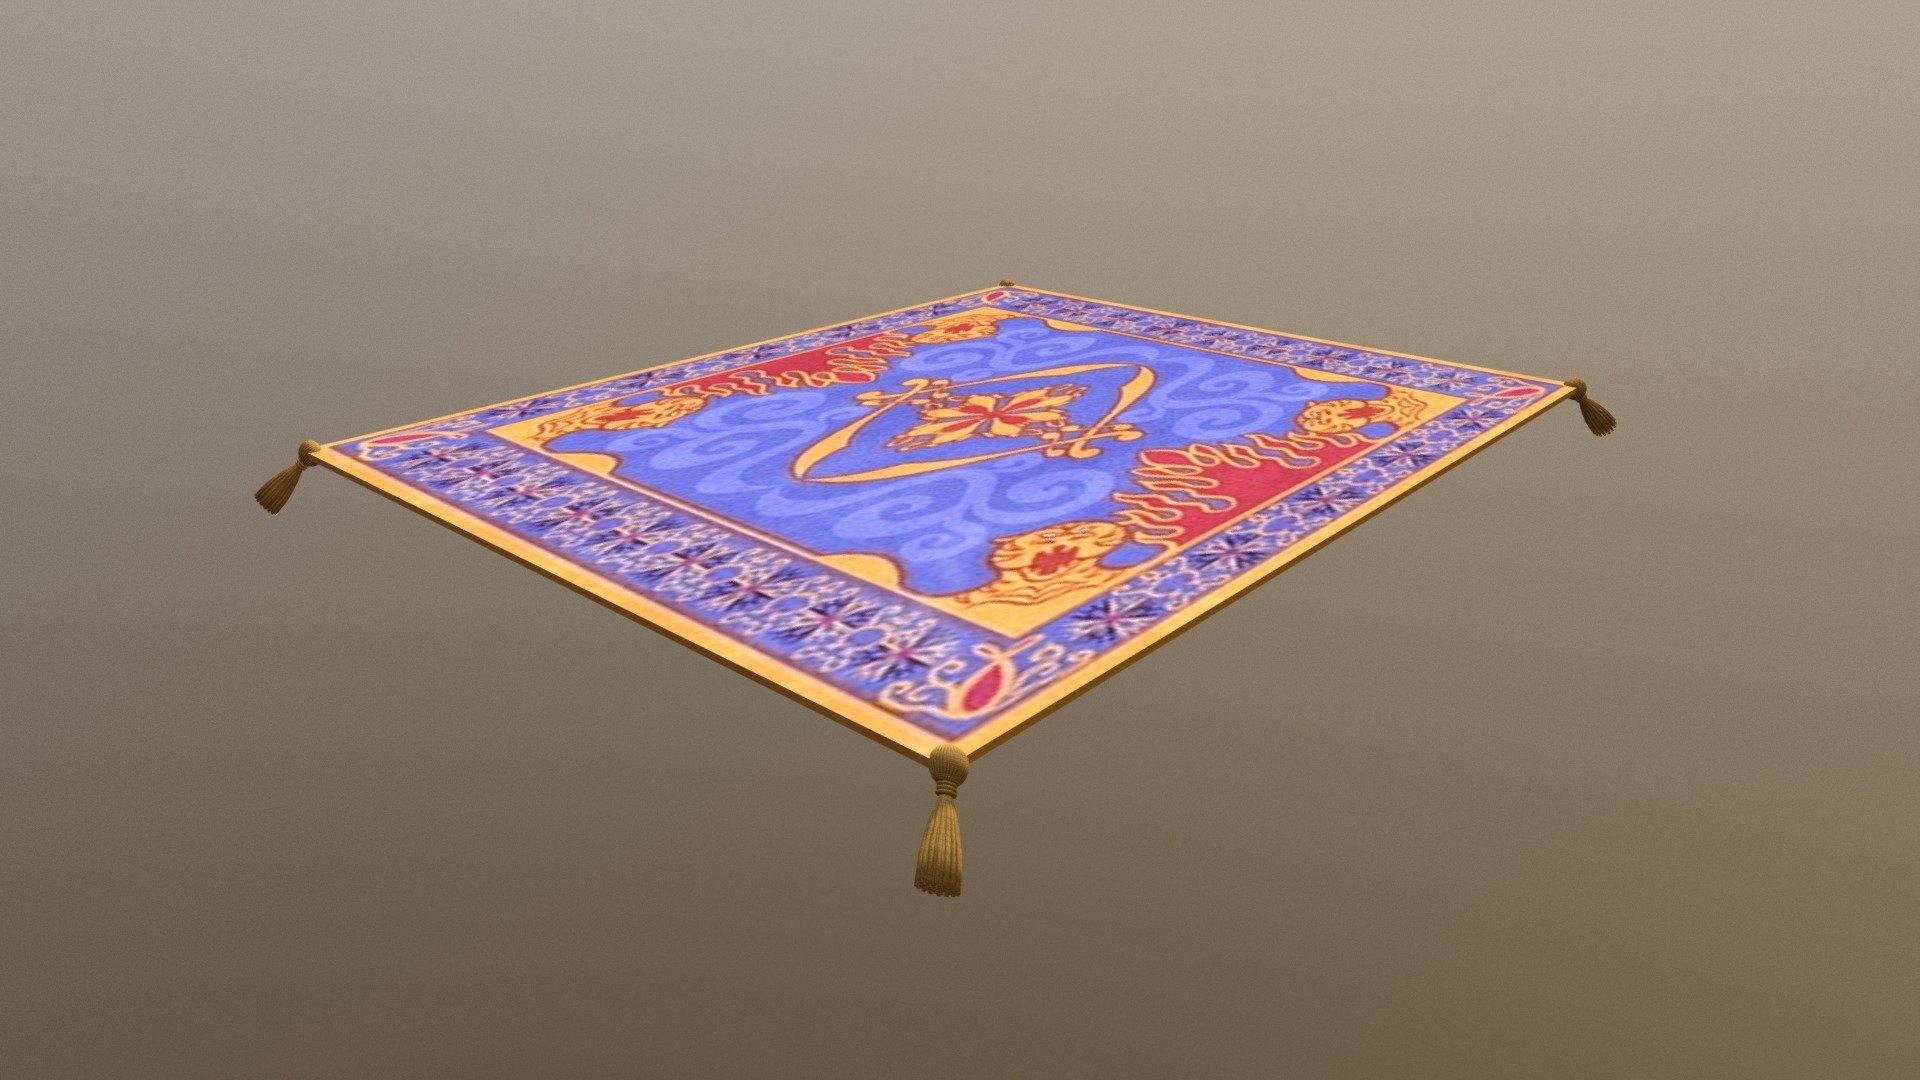 Aladdin S Magic Carpet Download Free 3d Model By Kremit Kremit 2c363d4 Sketchfab